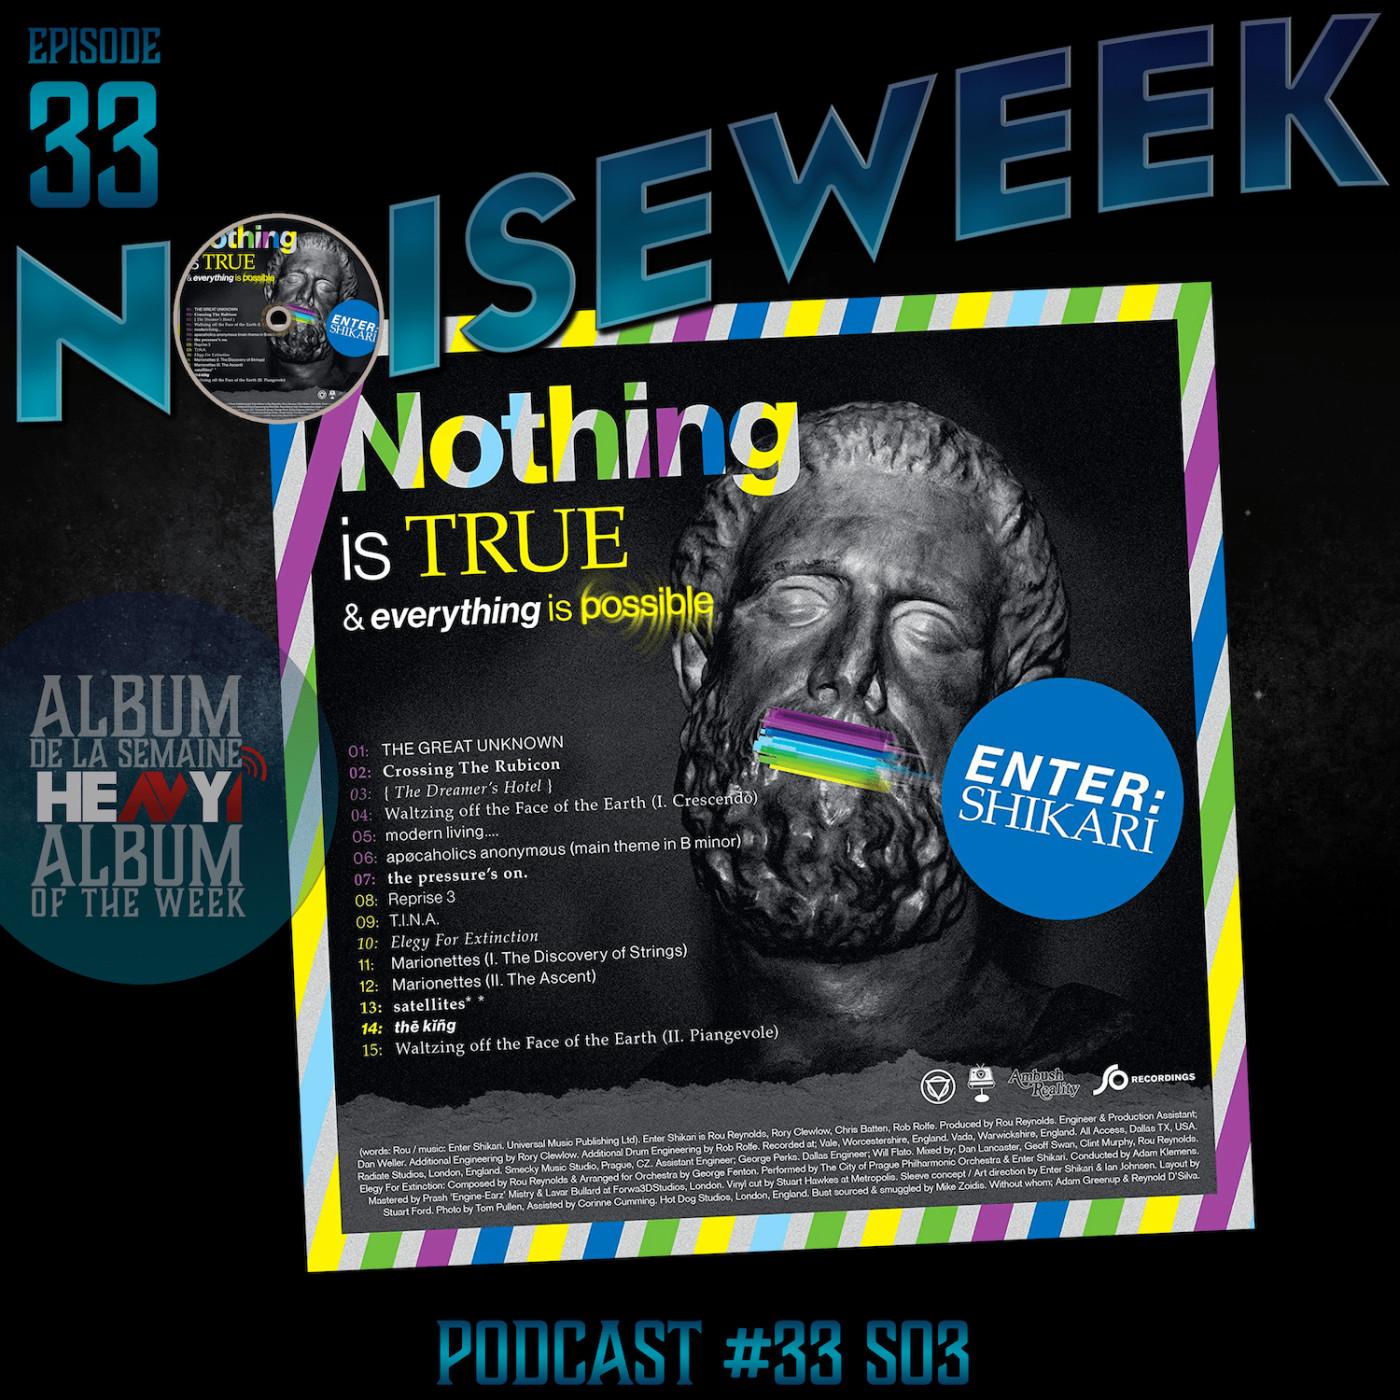 Noiseweek #33 Saison 3